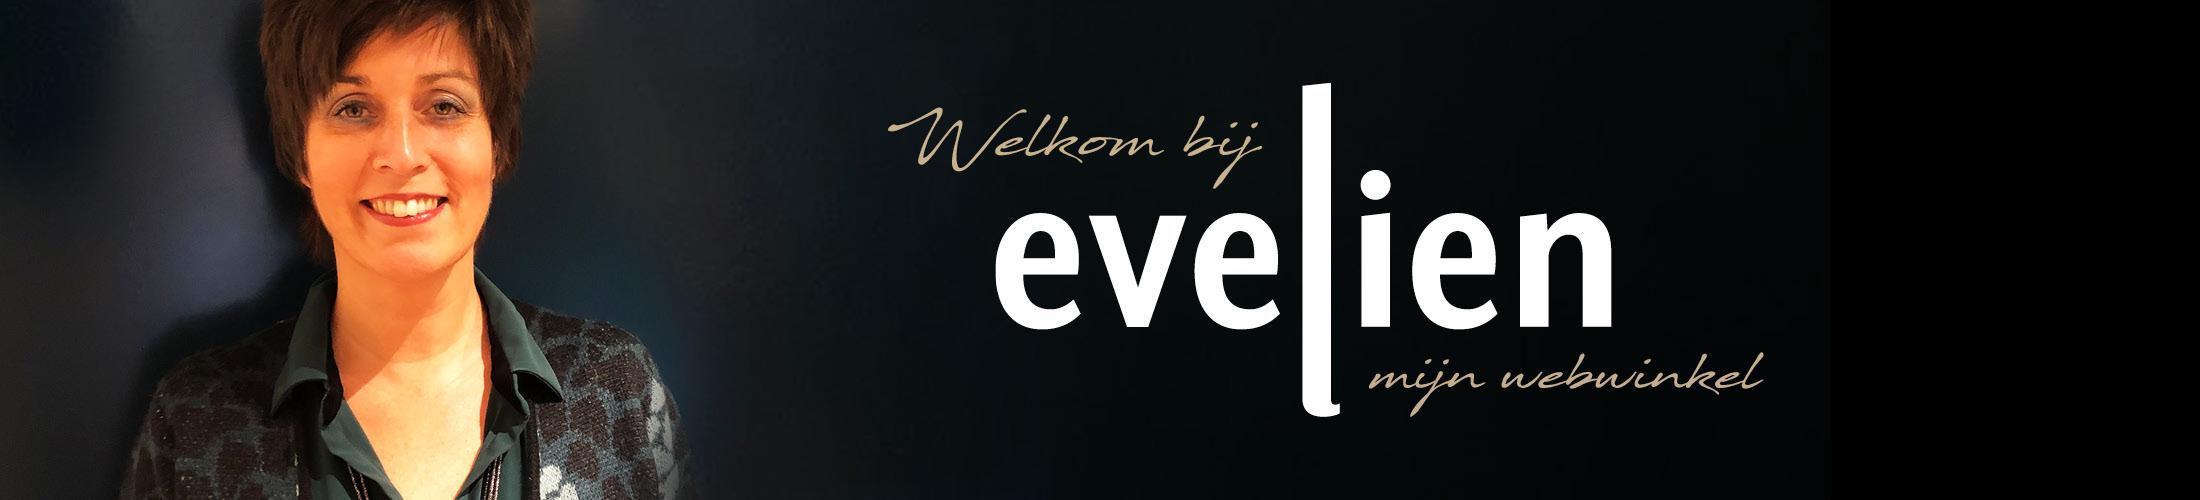 Evelien - mijn stijl webwinkel